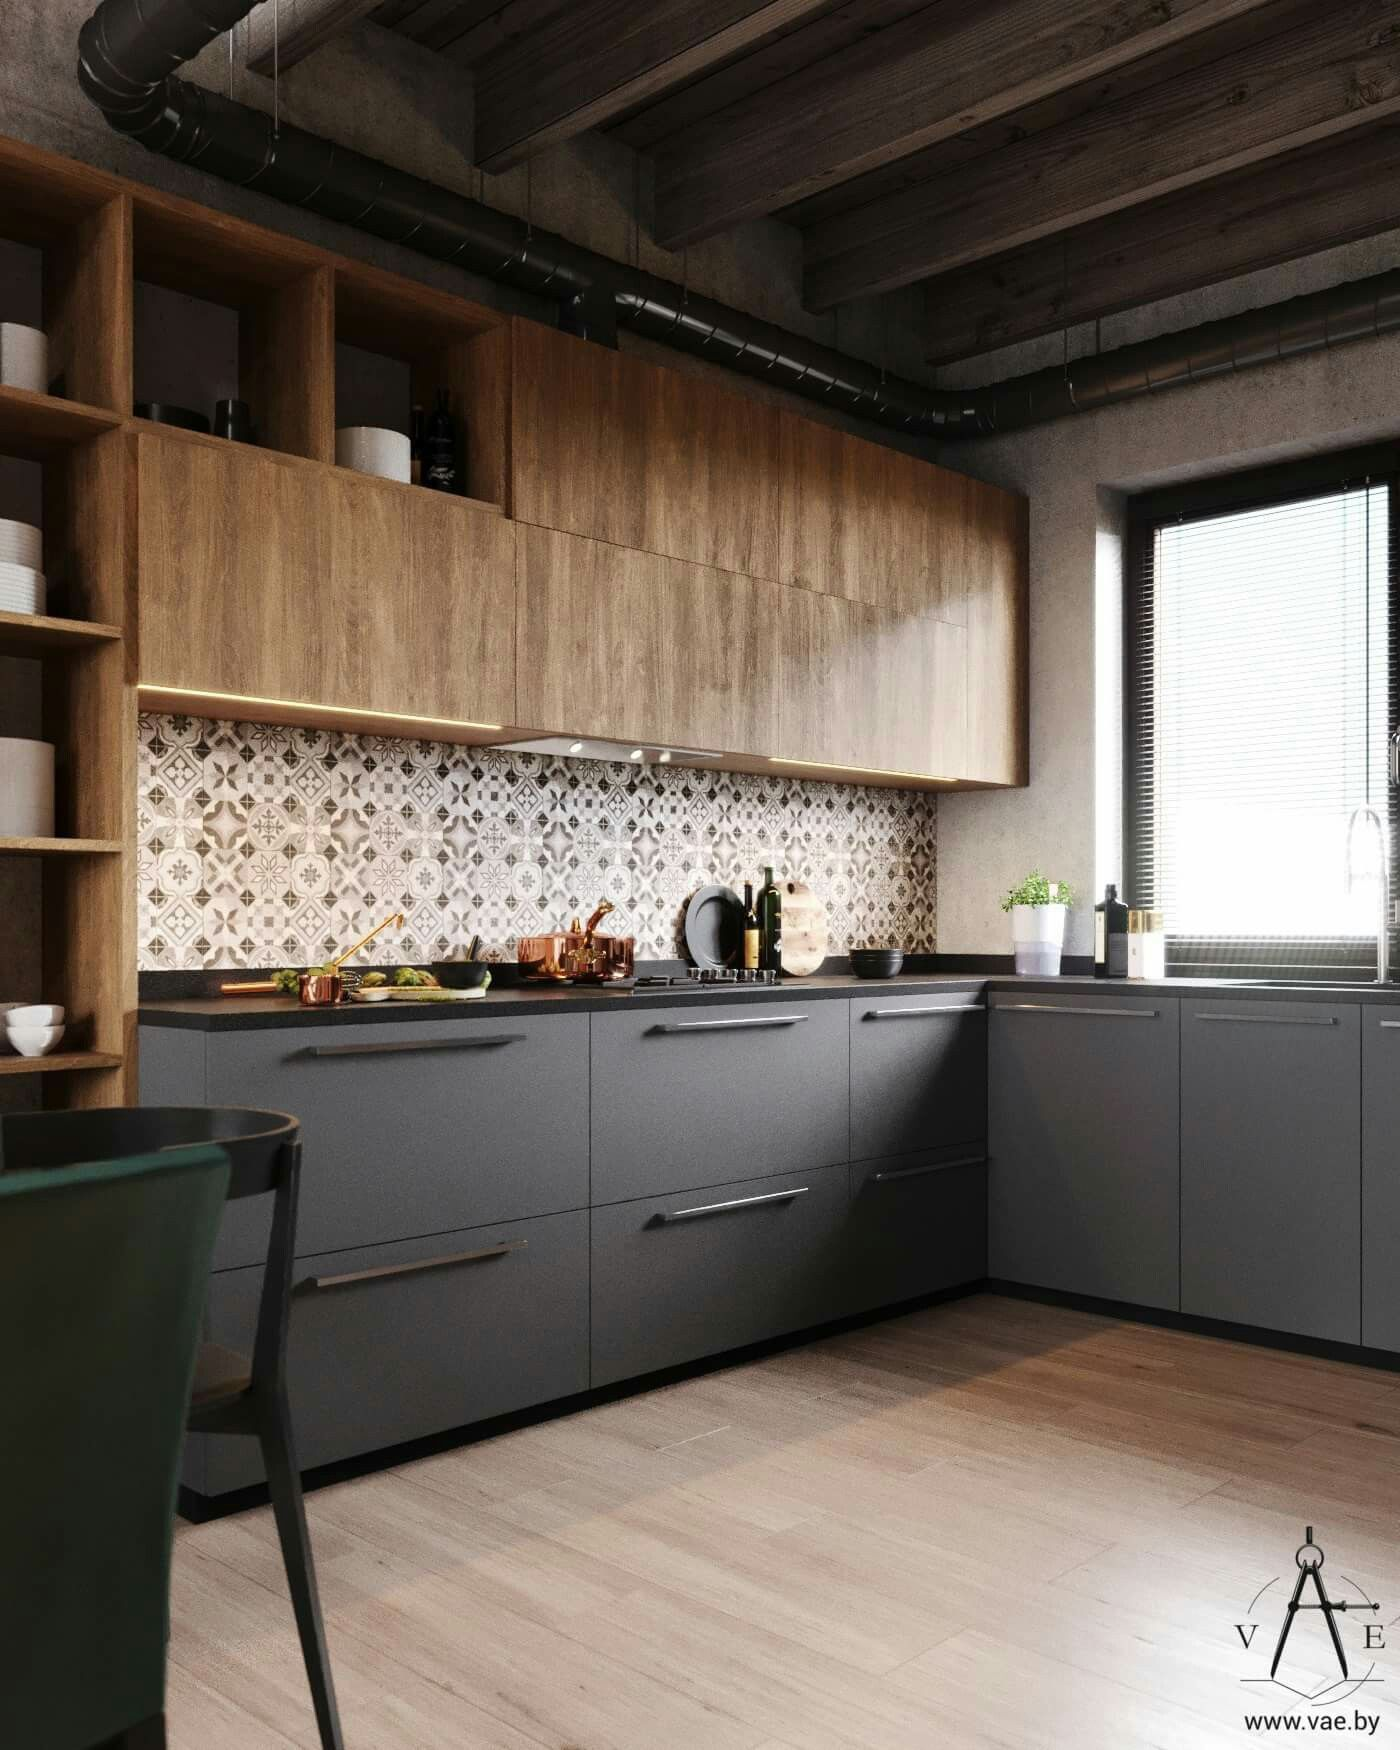 Muebles De Cocina De Madera Modernos | Materiales Para Cocinas I ...